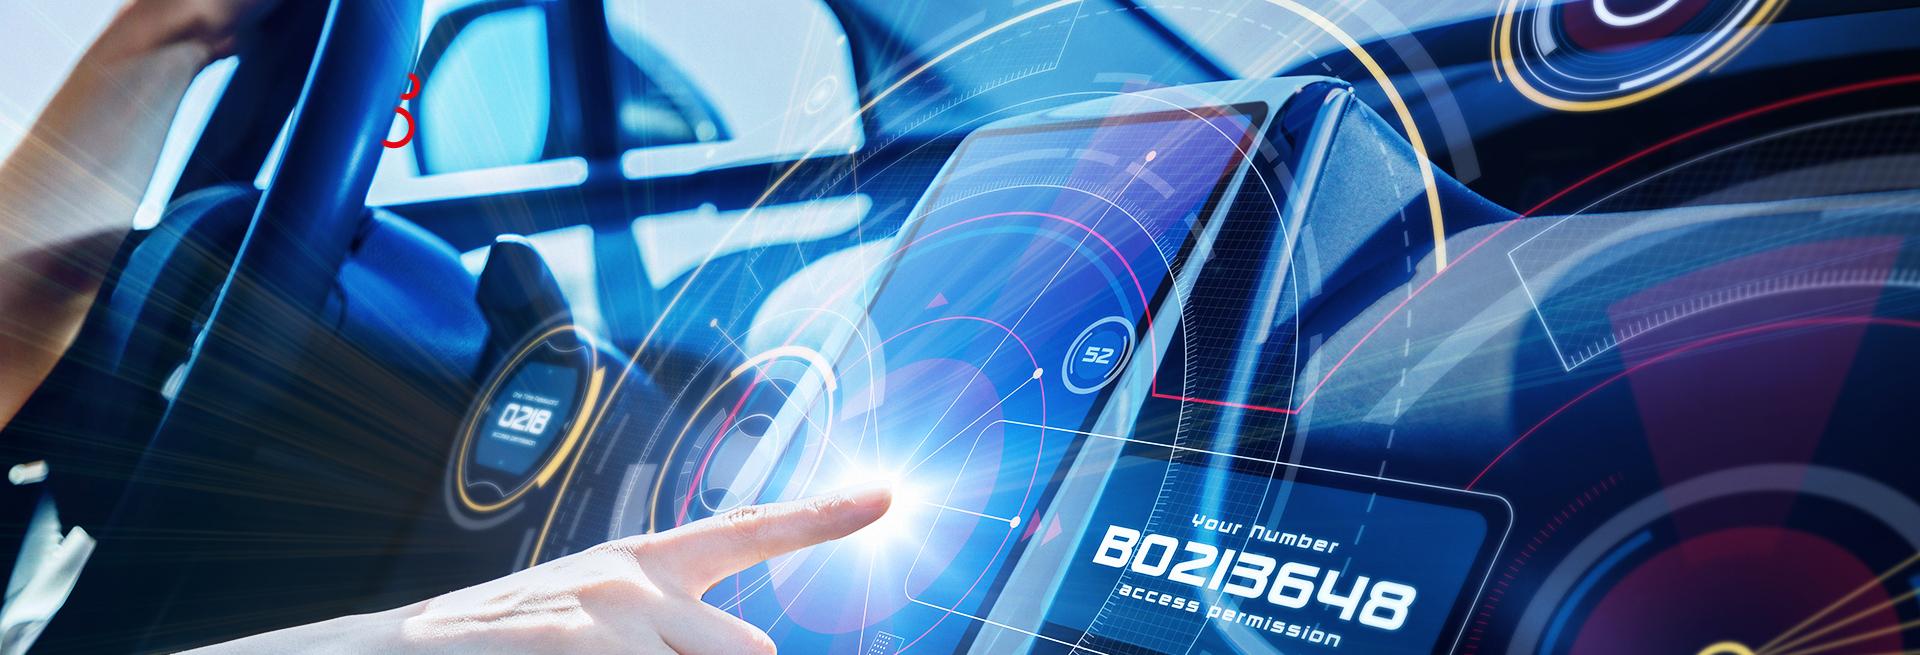 mercado automotivo: tendências realistas